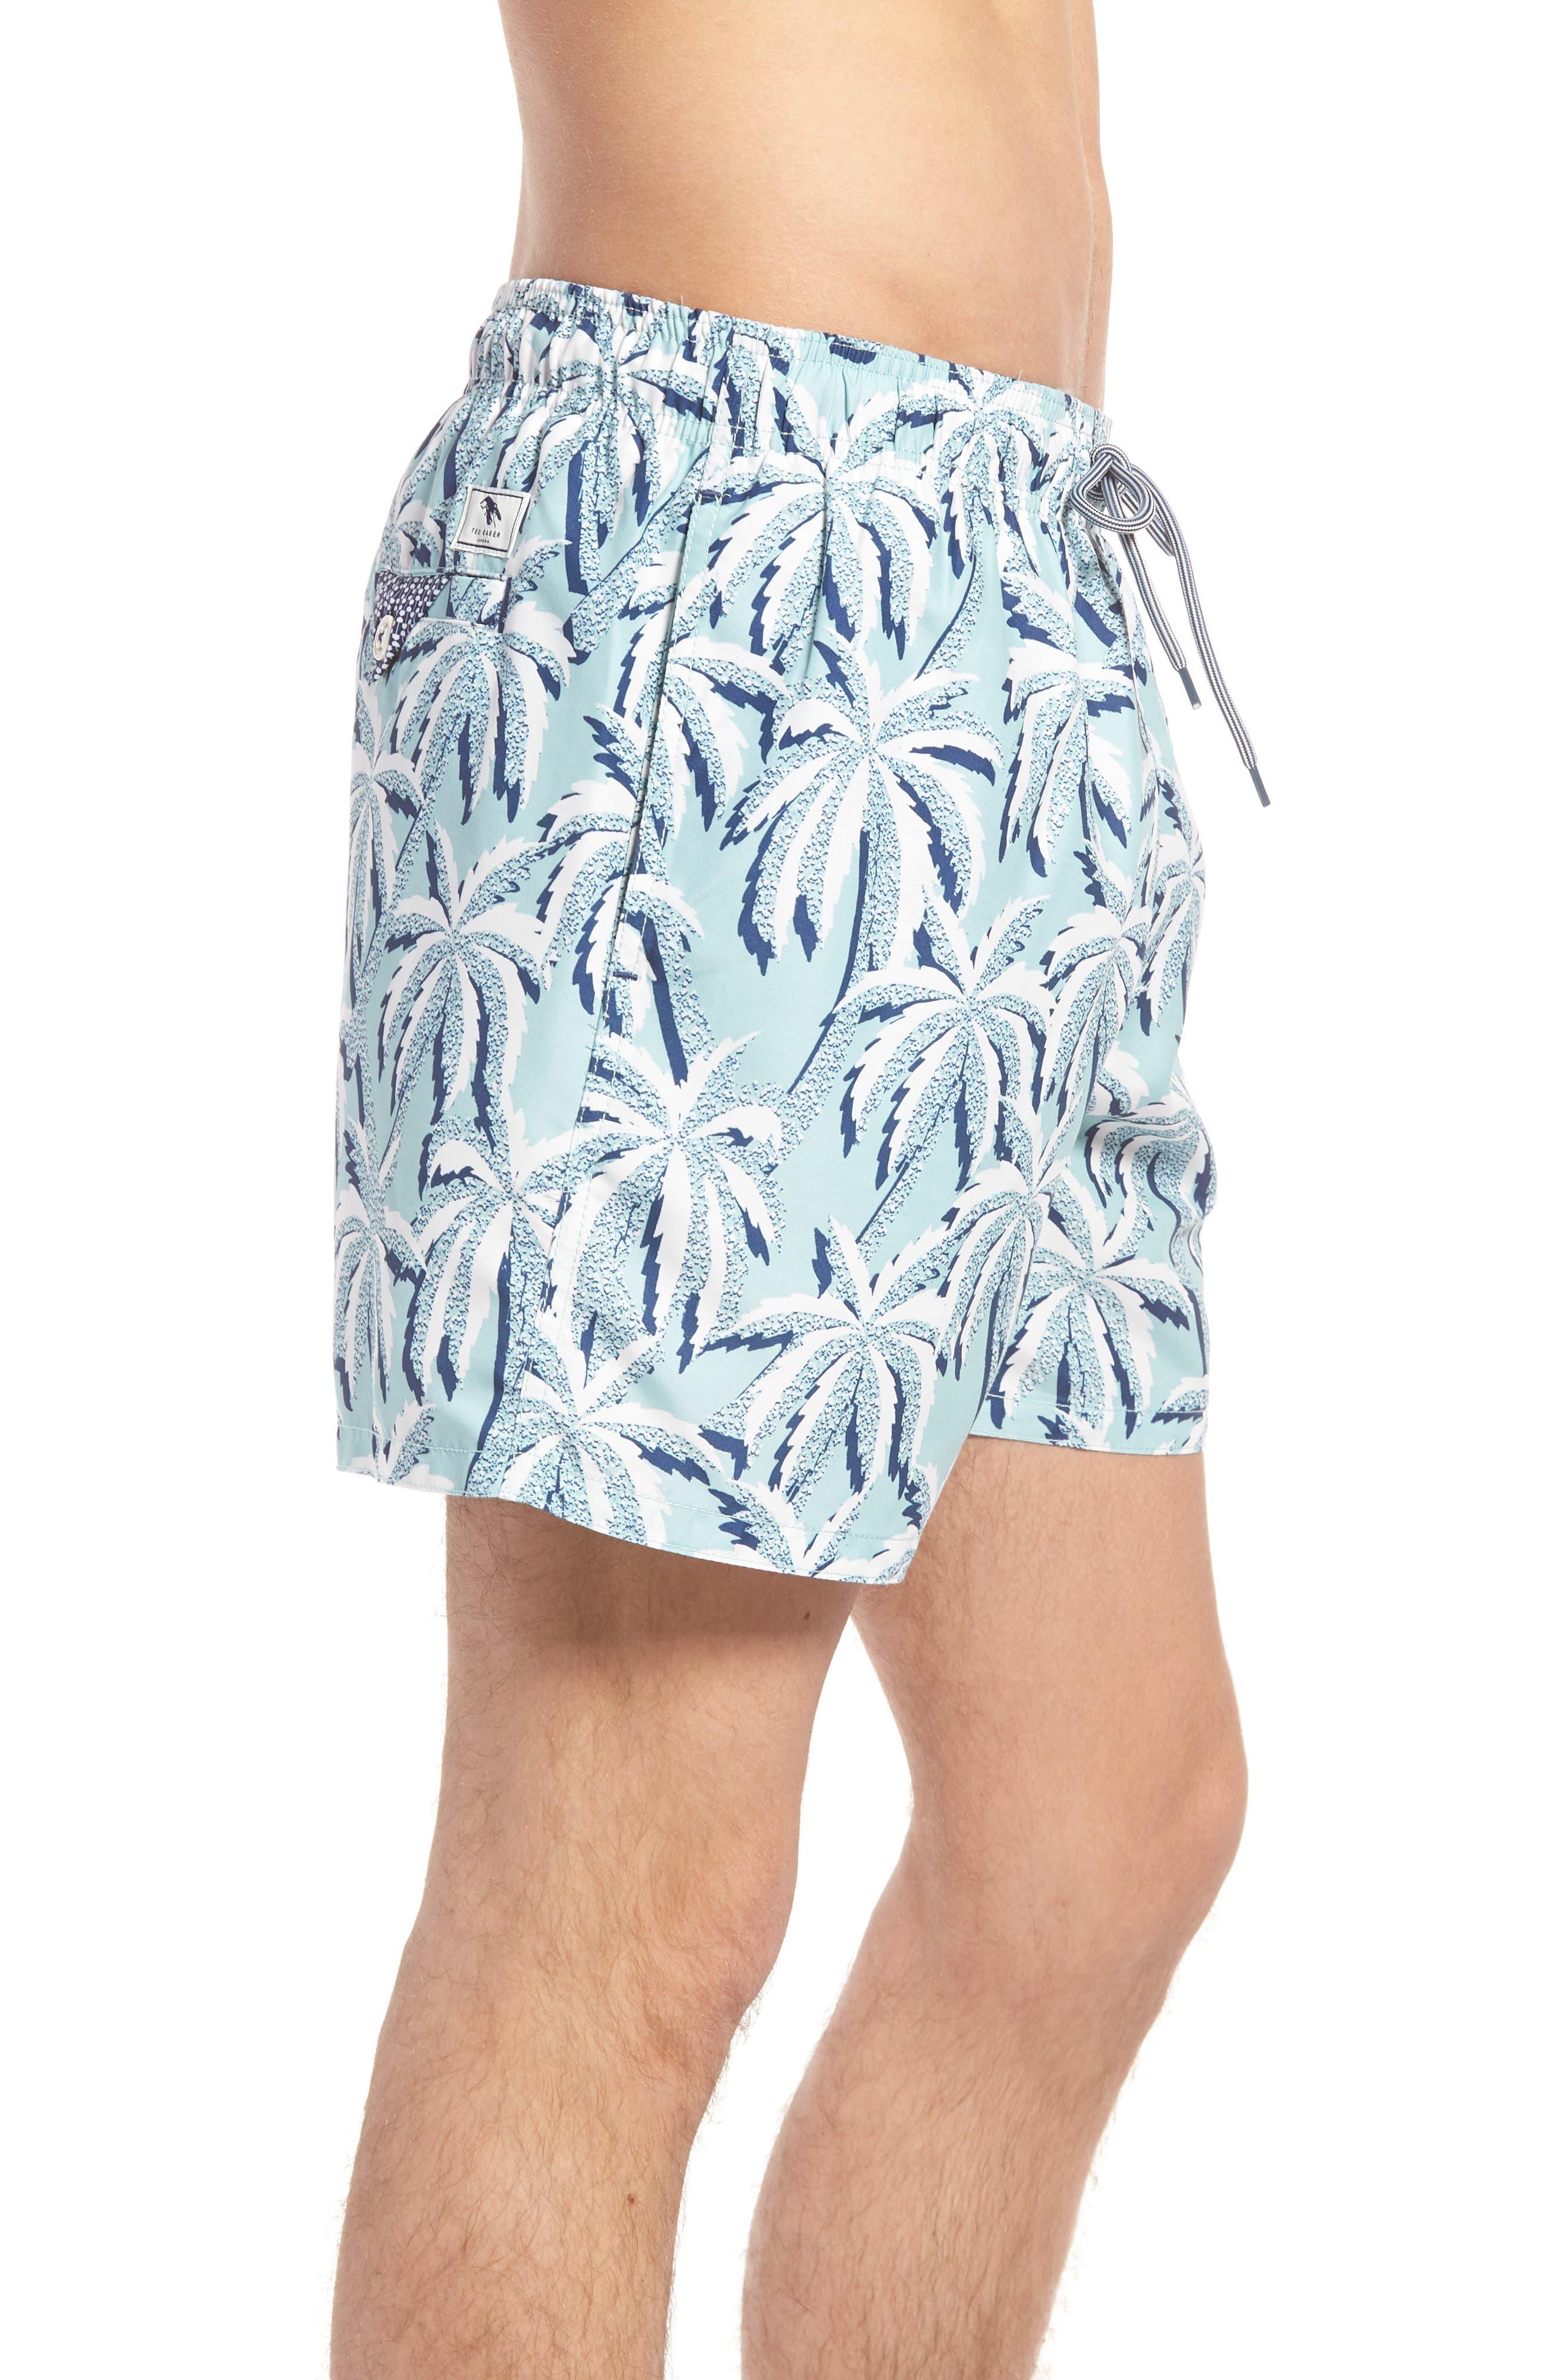 Hoppah Palm Print Swim Shorts,                             Alternate thumbnail 3, color,                             Mint